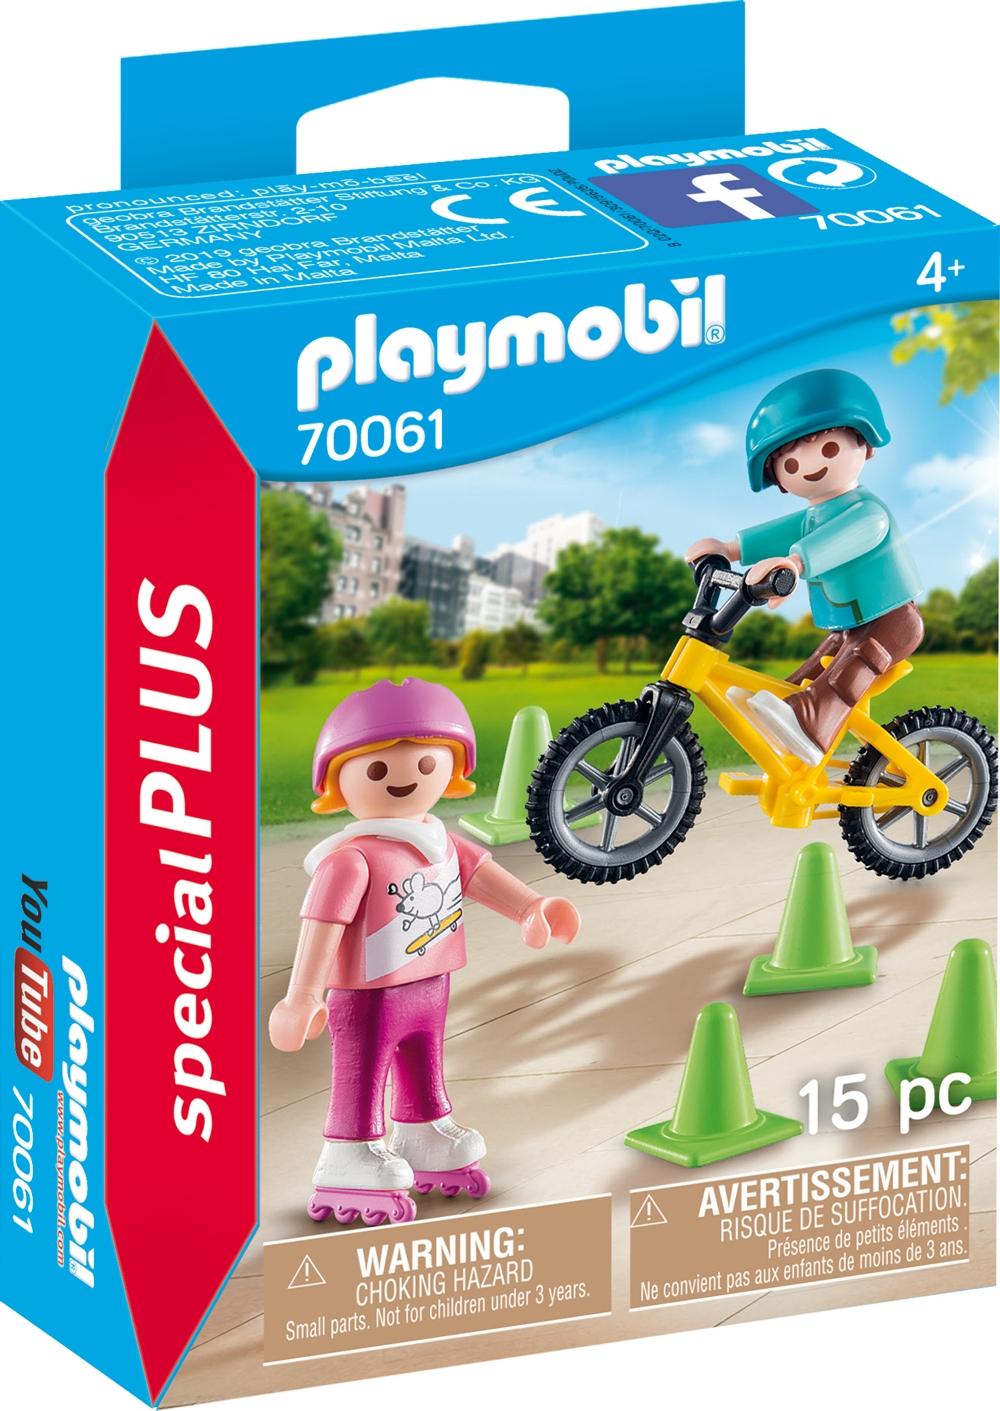 PLAYMOBIL 70061 Kinder mit Skates und BMX-Rad